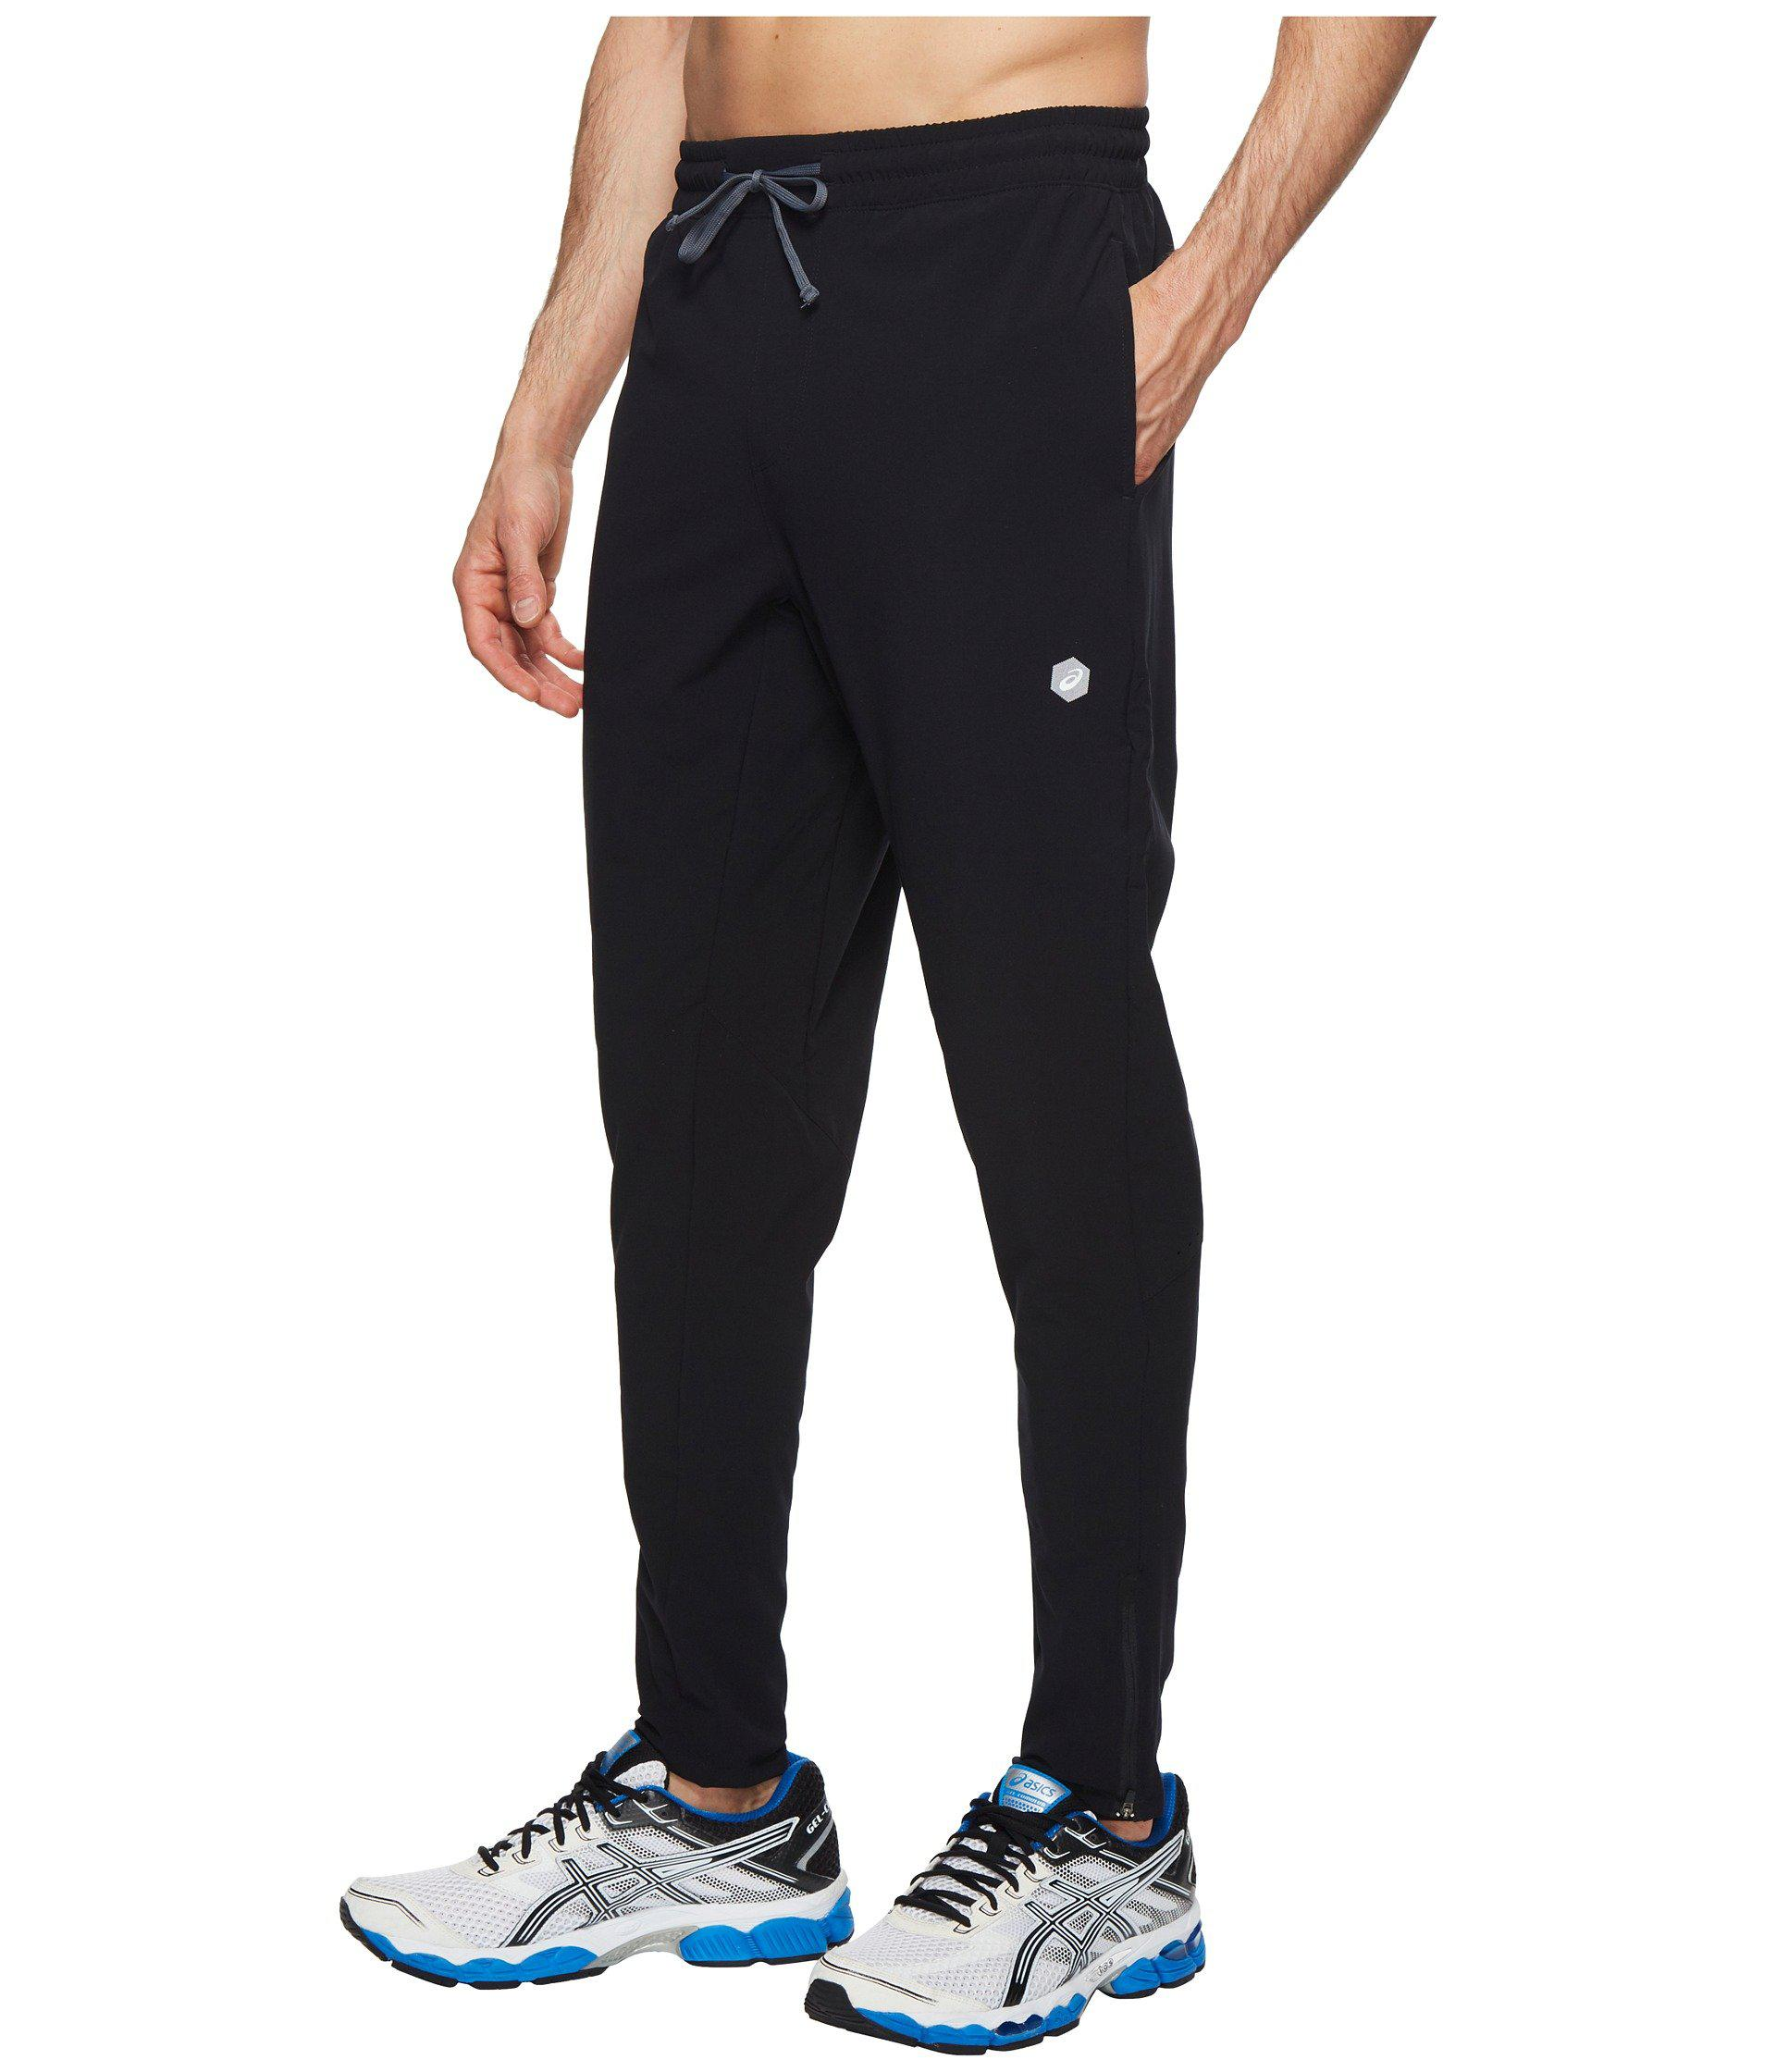 903db45d5369 Lyst - Asics Run Woven Track Pants (castlerock) Men s Workout in Black for  Men